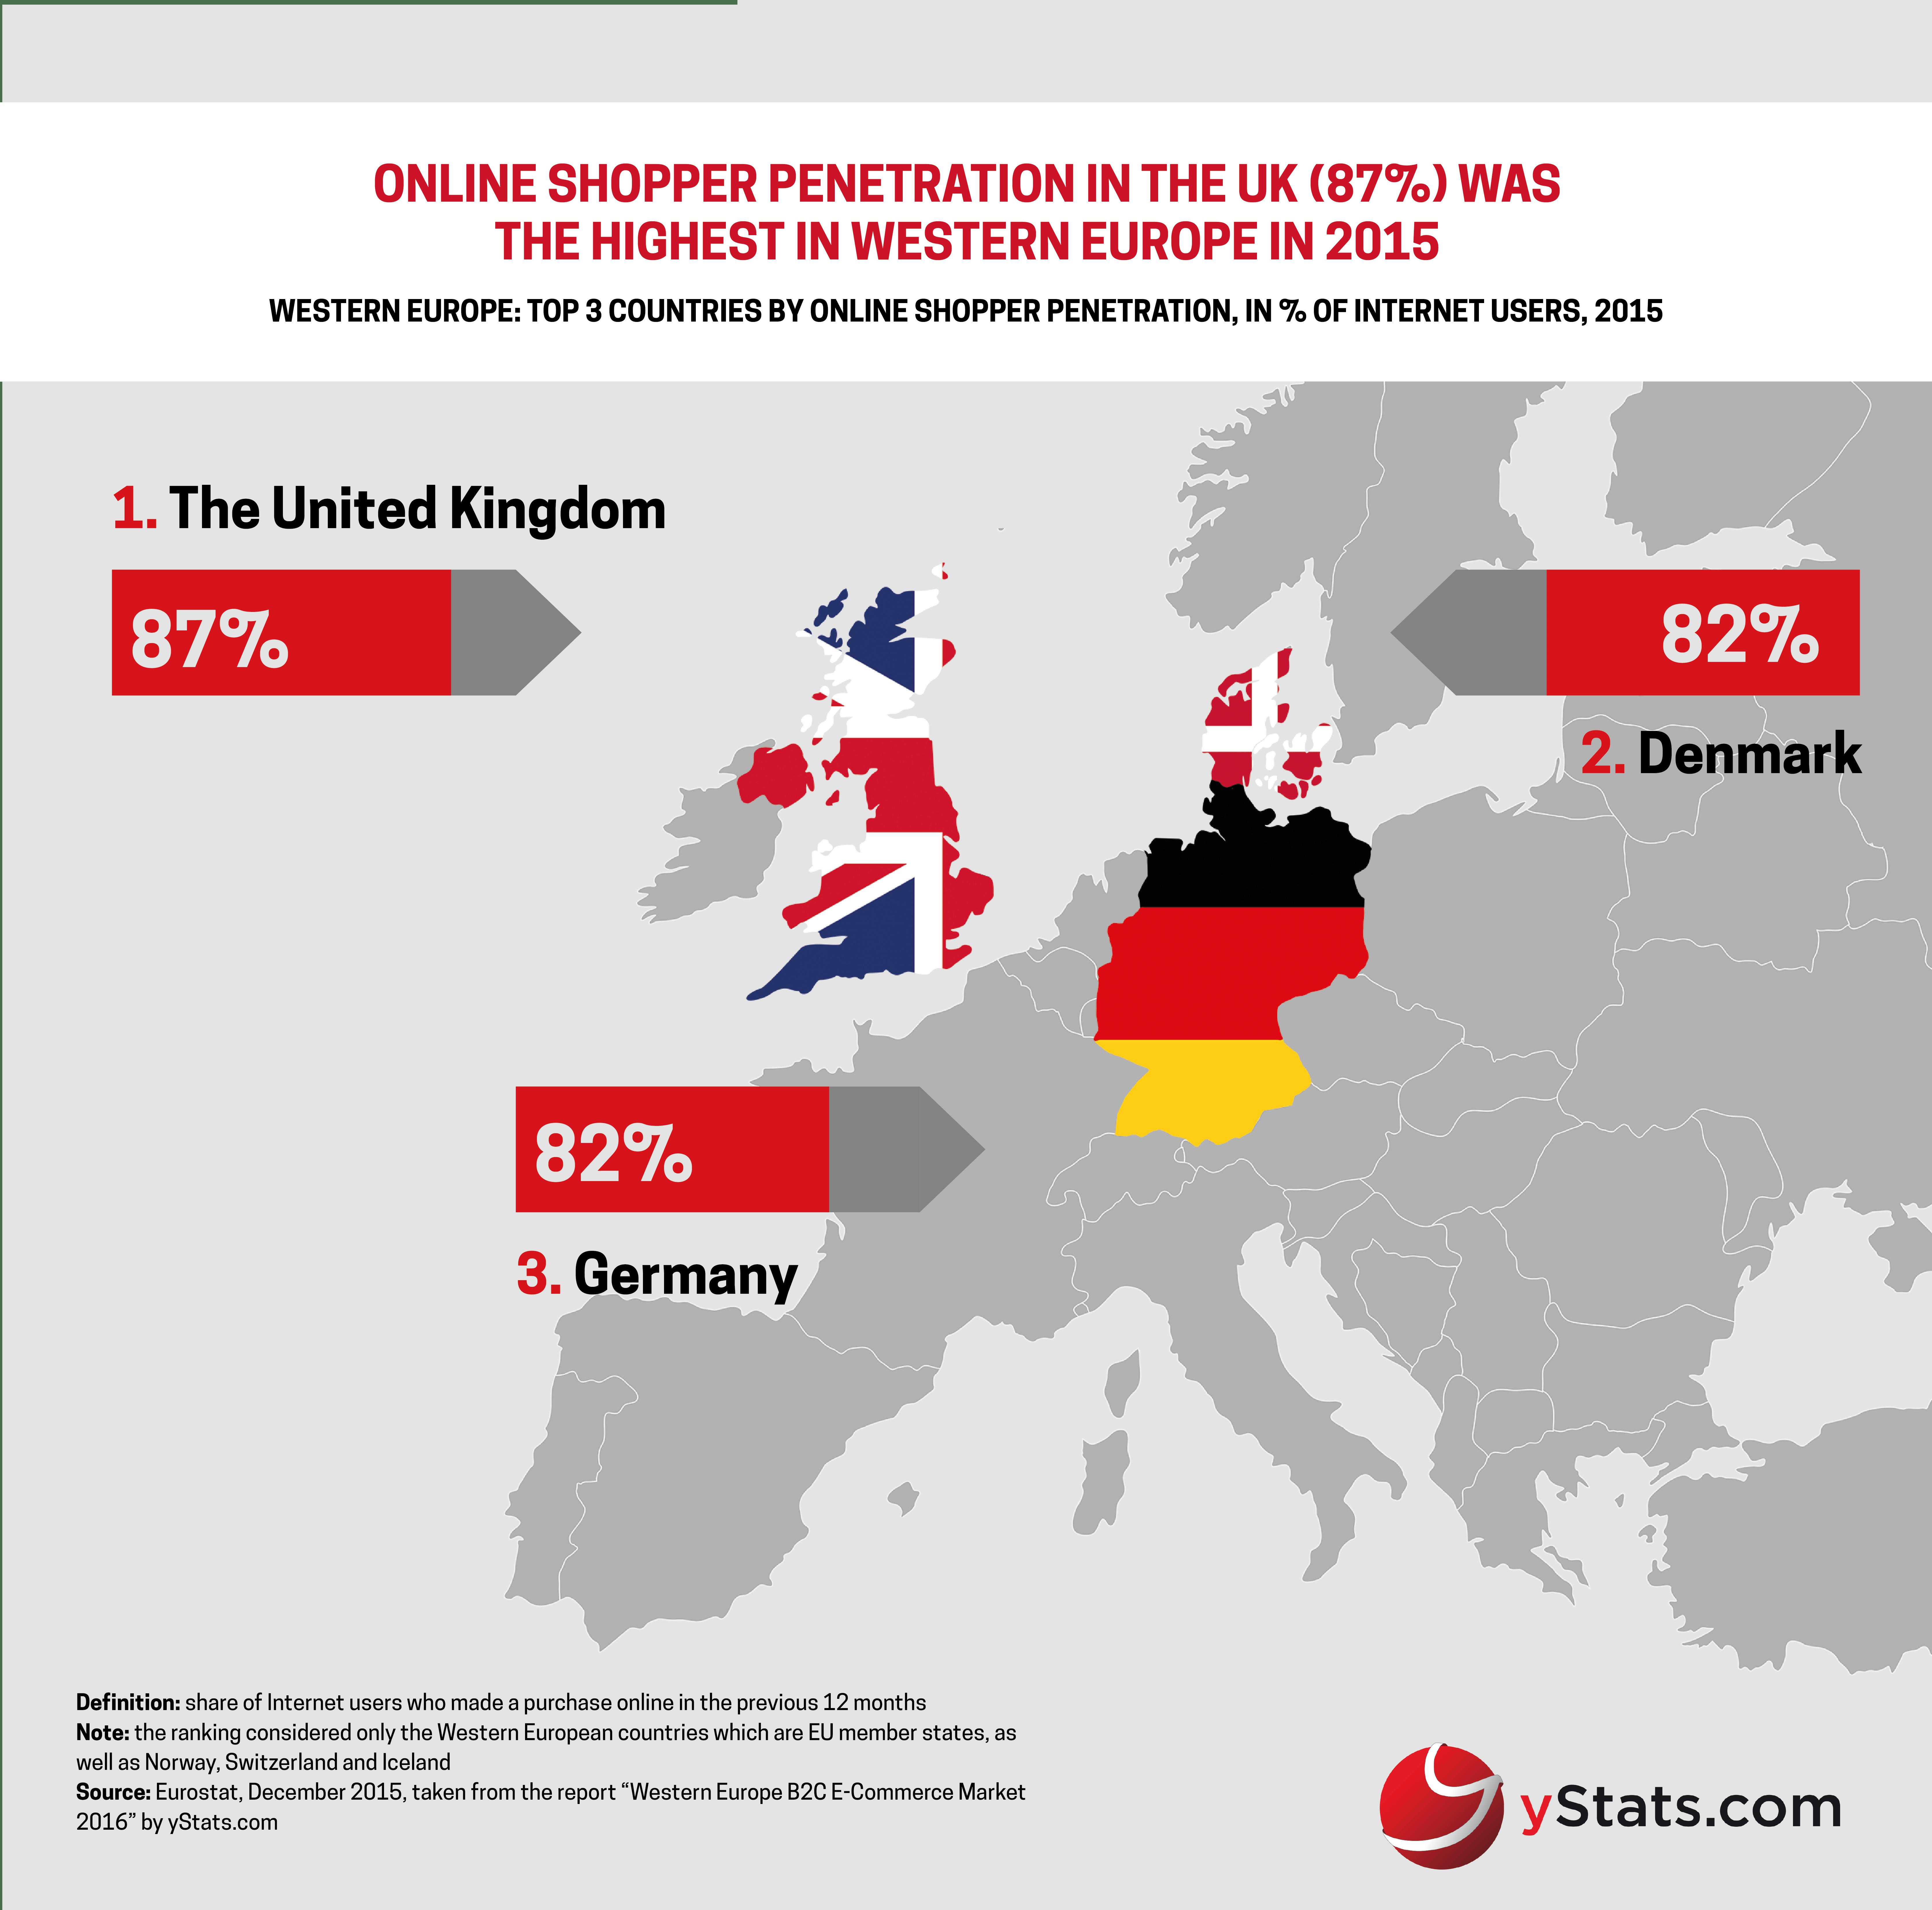 E Commerce Site Map: YStats.com Infographic Western Europe B2C E-Commerce